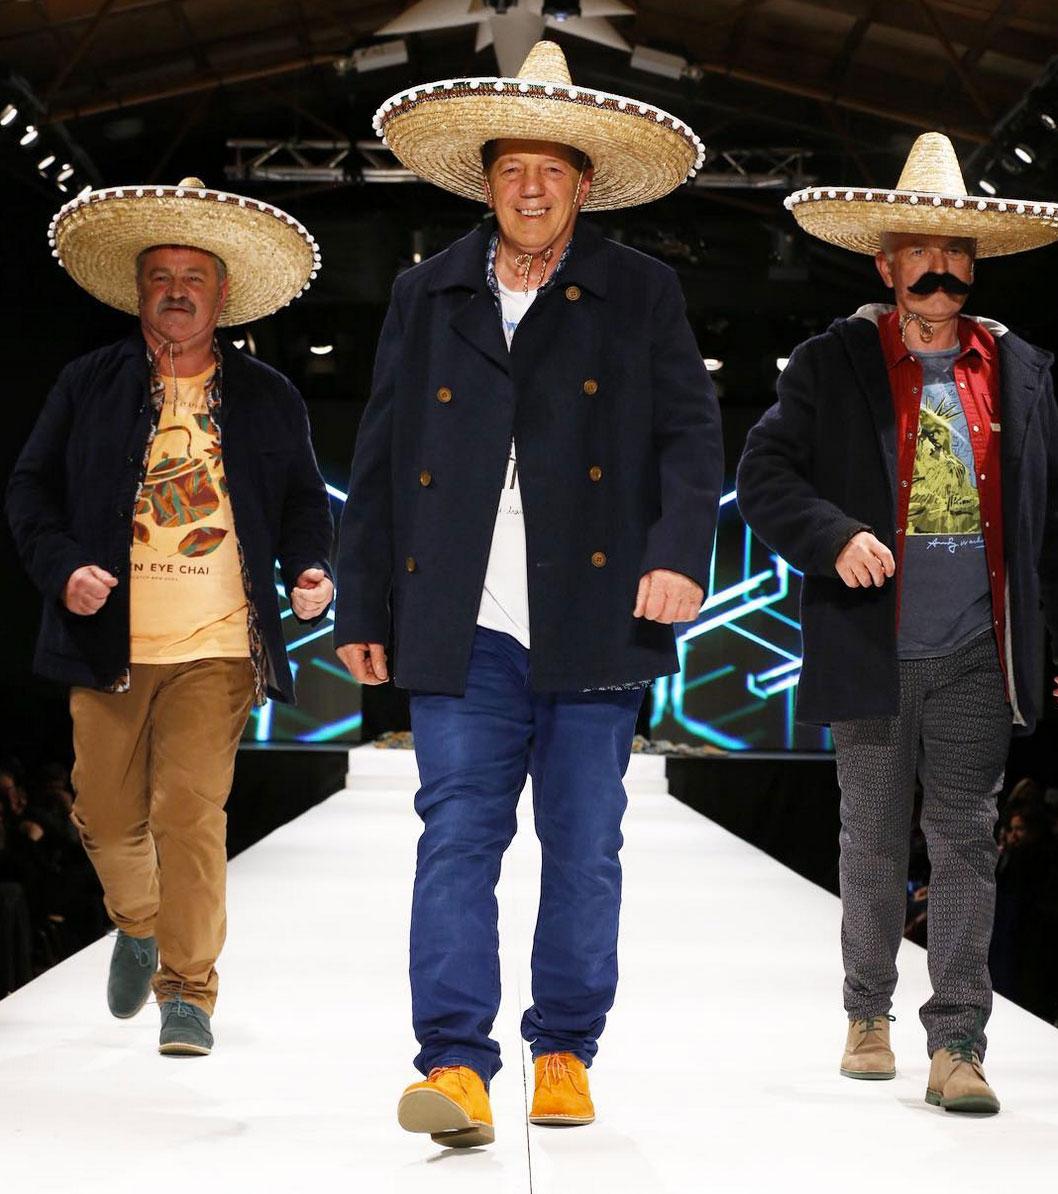 The three majors of Southland make a surprise appearance on the catwalk at the Hokonui Fashion Design Awards on Saturday night. (Mayor Tracy Hicks, Mayor Gary Tong, Mayor Tim Shadbolt)